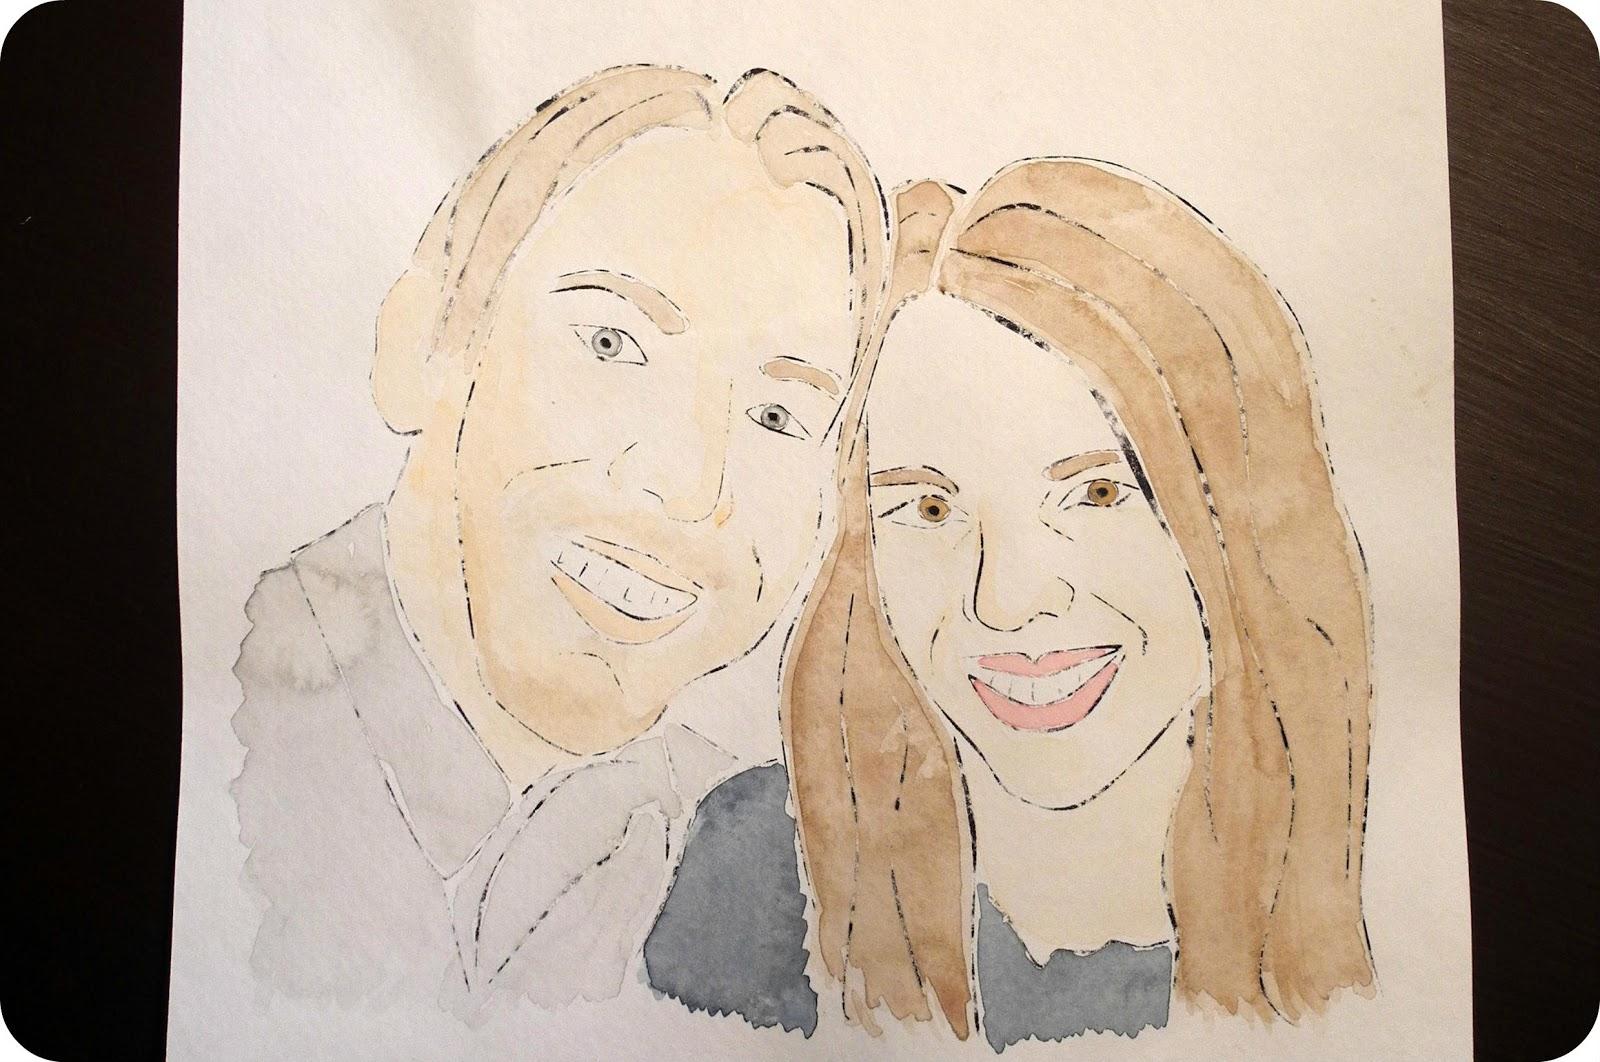 http://4.bp.blogspot.com/-xVbpC__mmqE/UJ1NxrfEpMI/AAAAAAAAFDk/DjVhD5bMFl0/s1600/Watercolor+Painting+Art+Personal+Couples+Portrait+Laurendy+Home.jpg